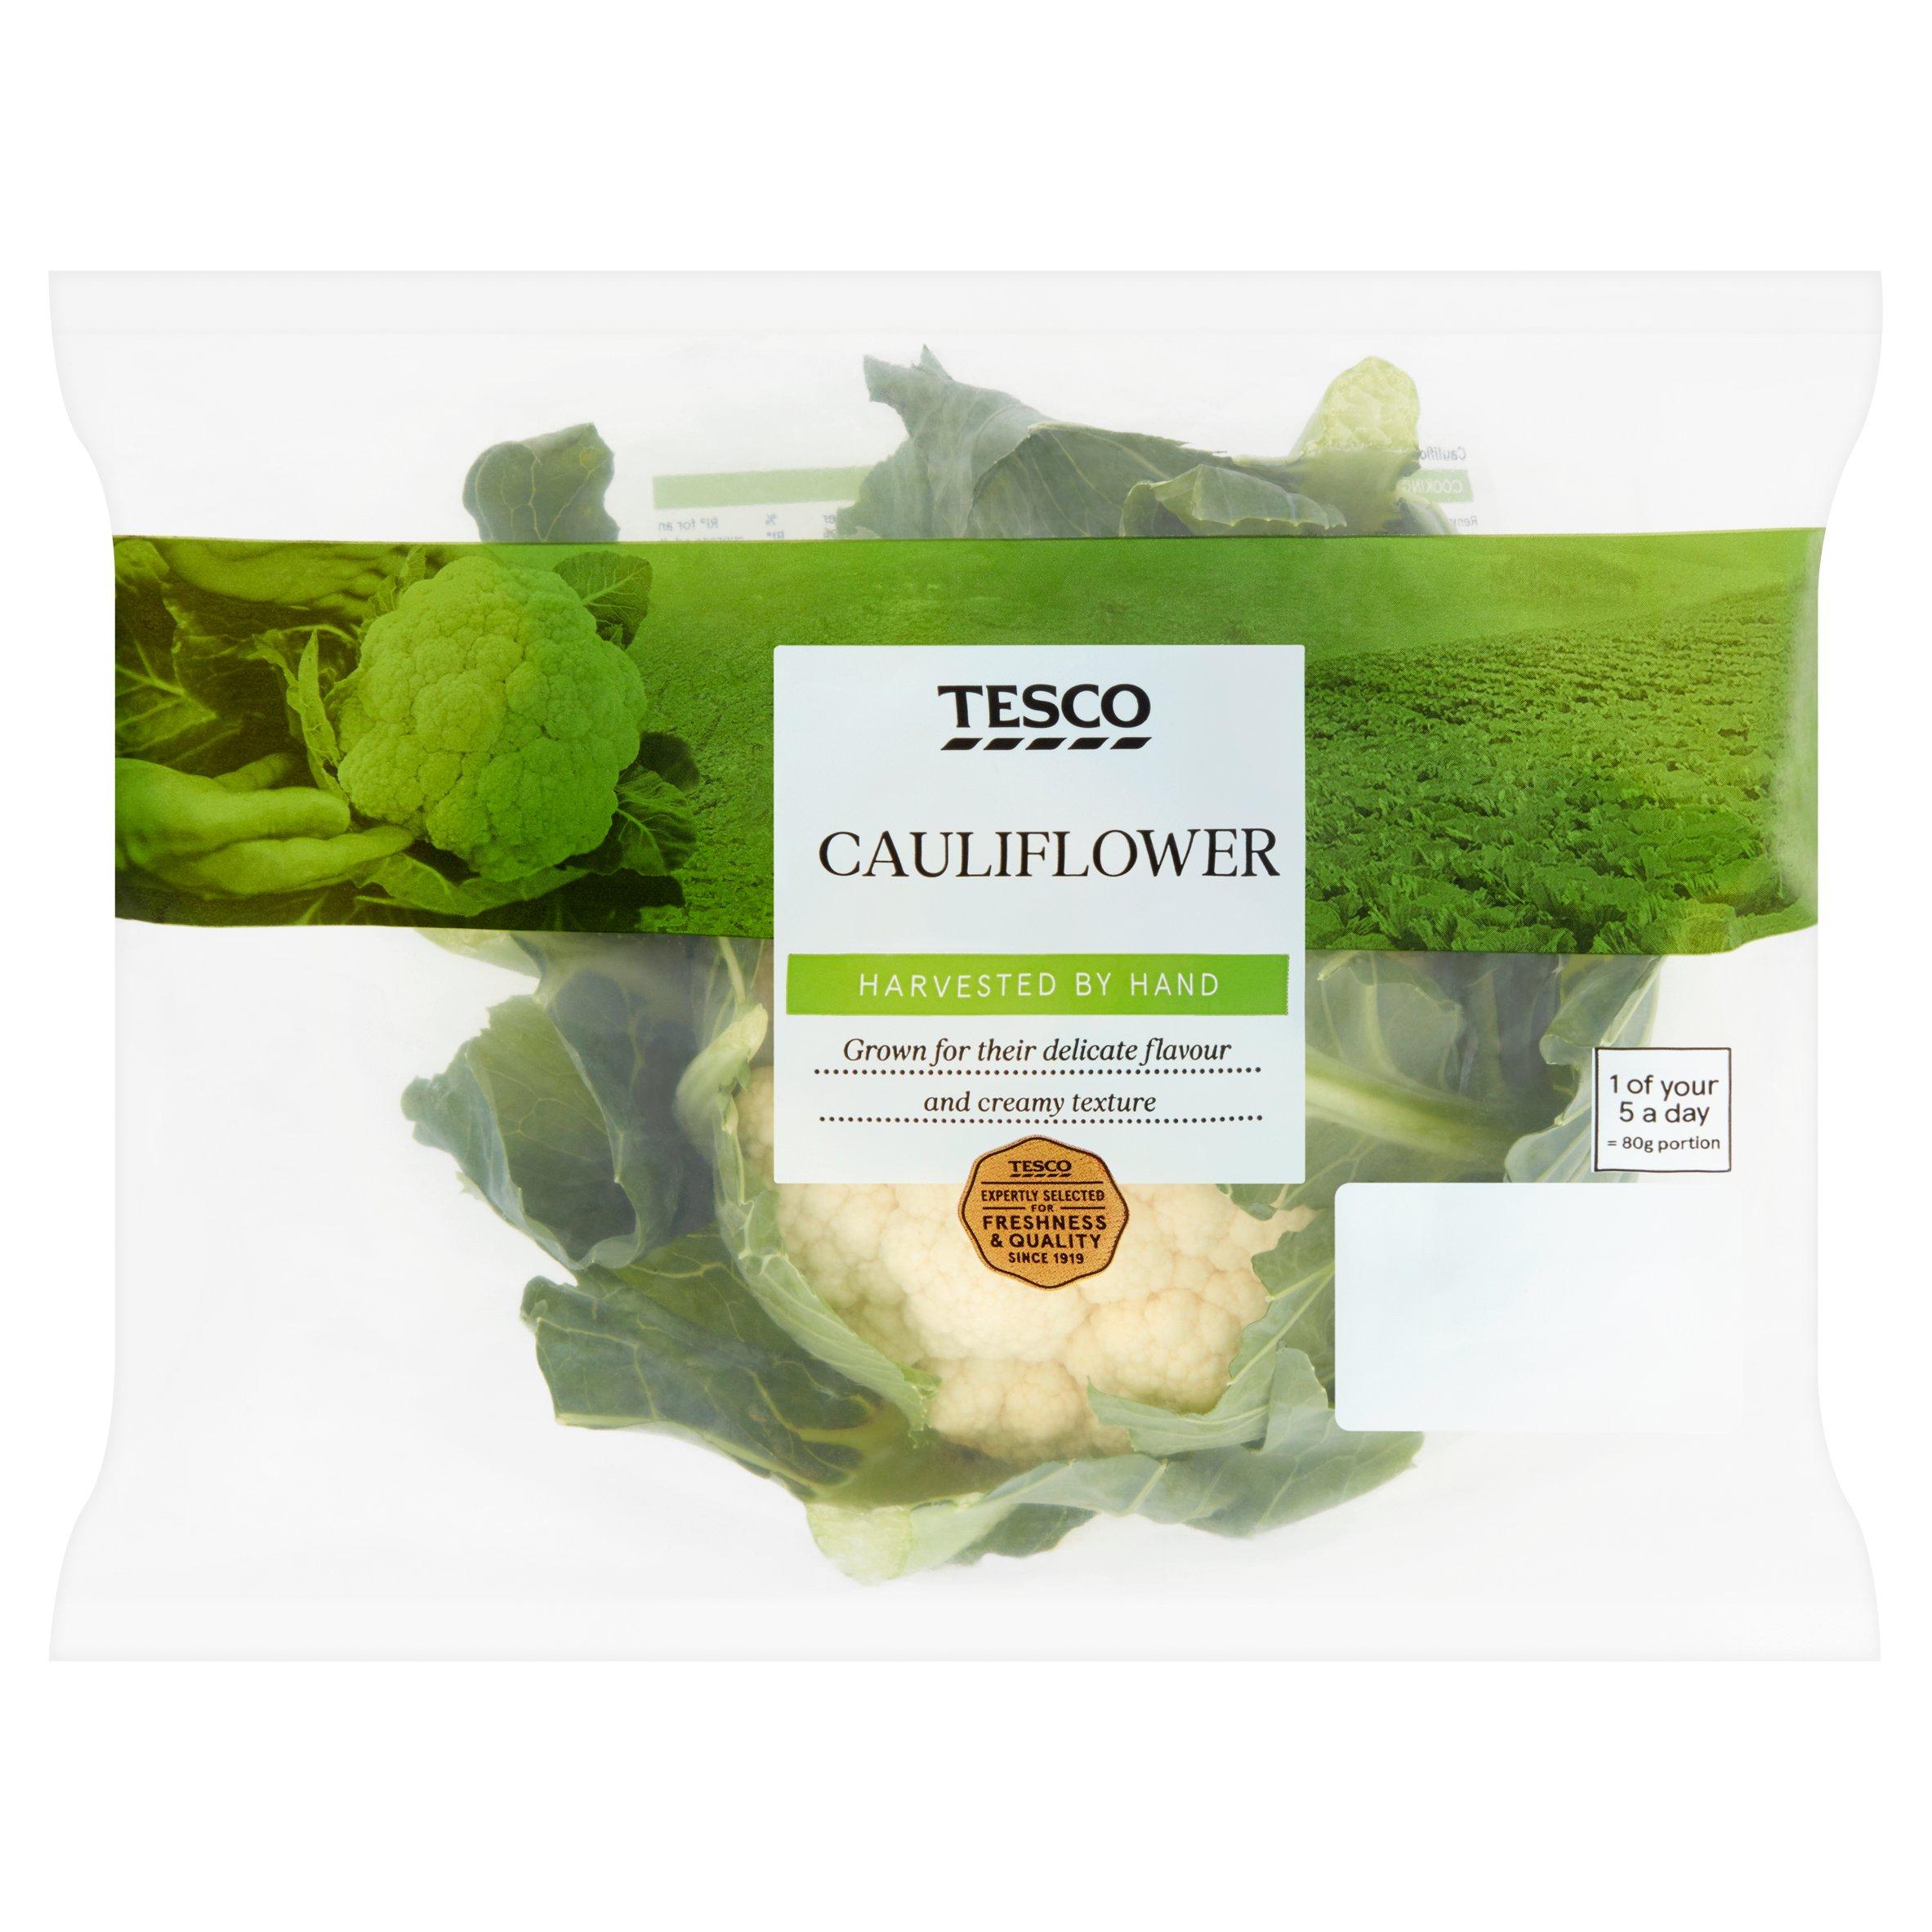 Tesco Cauliflower